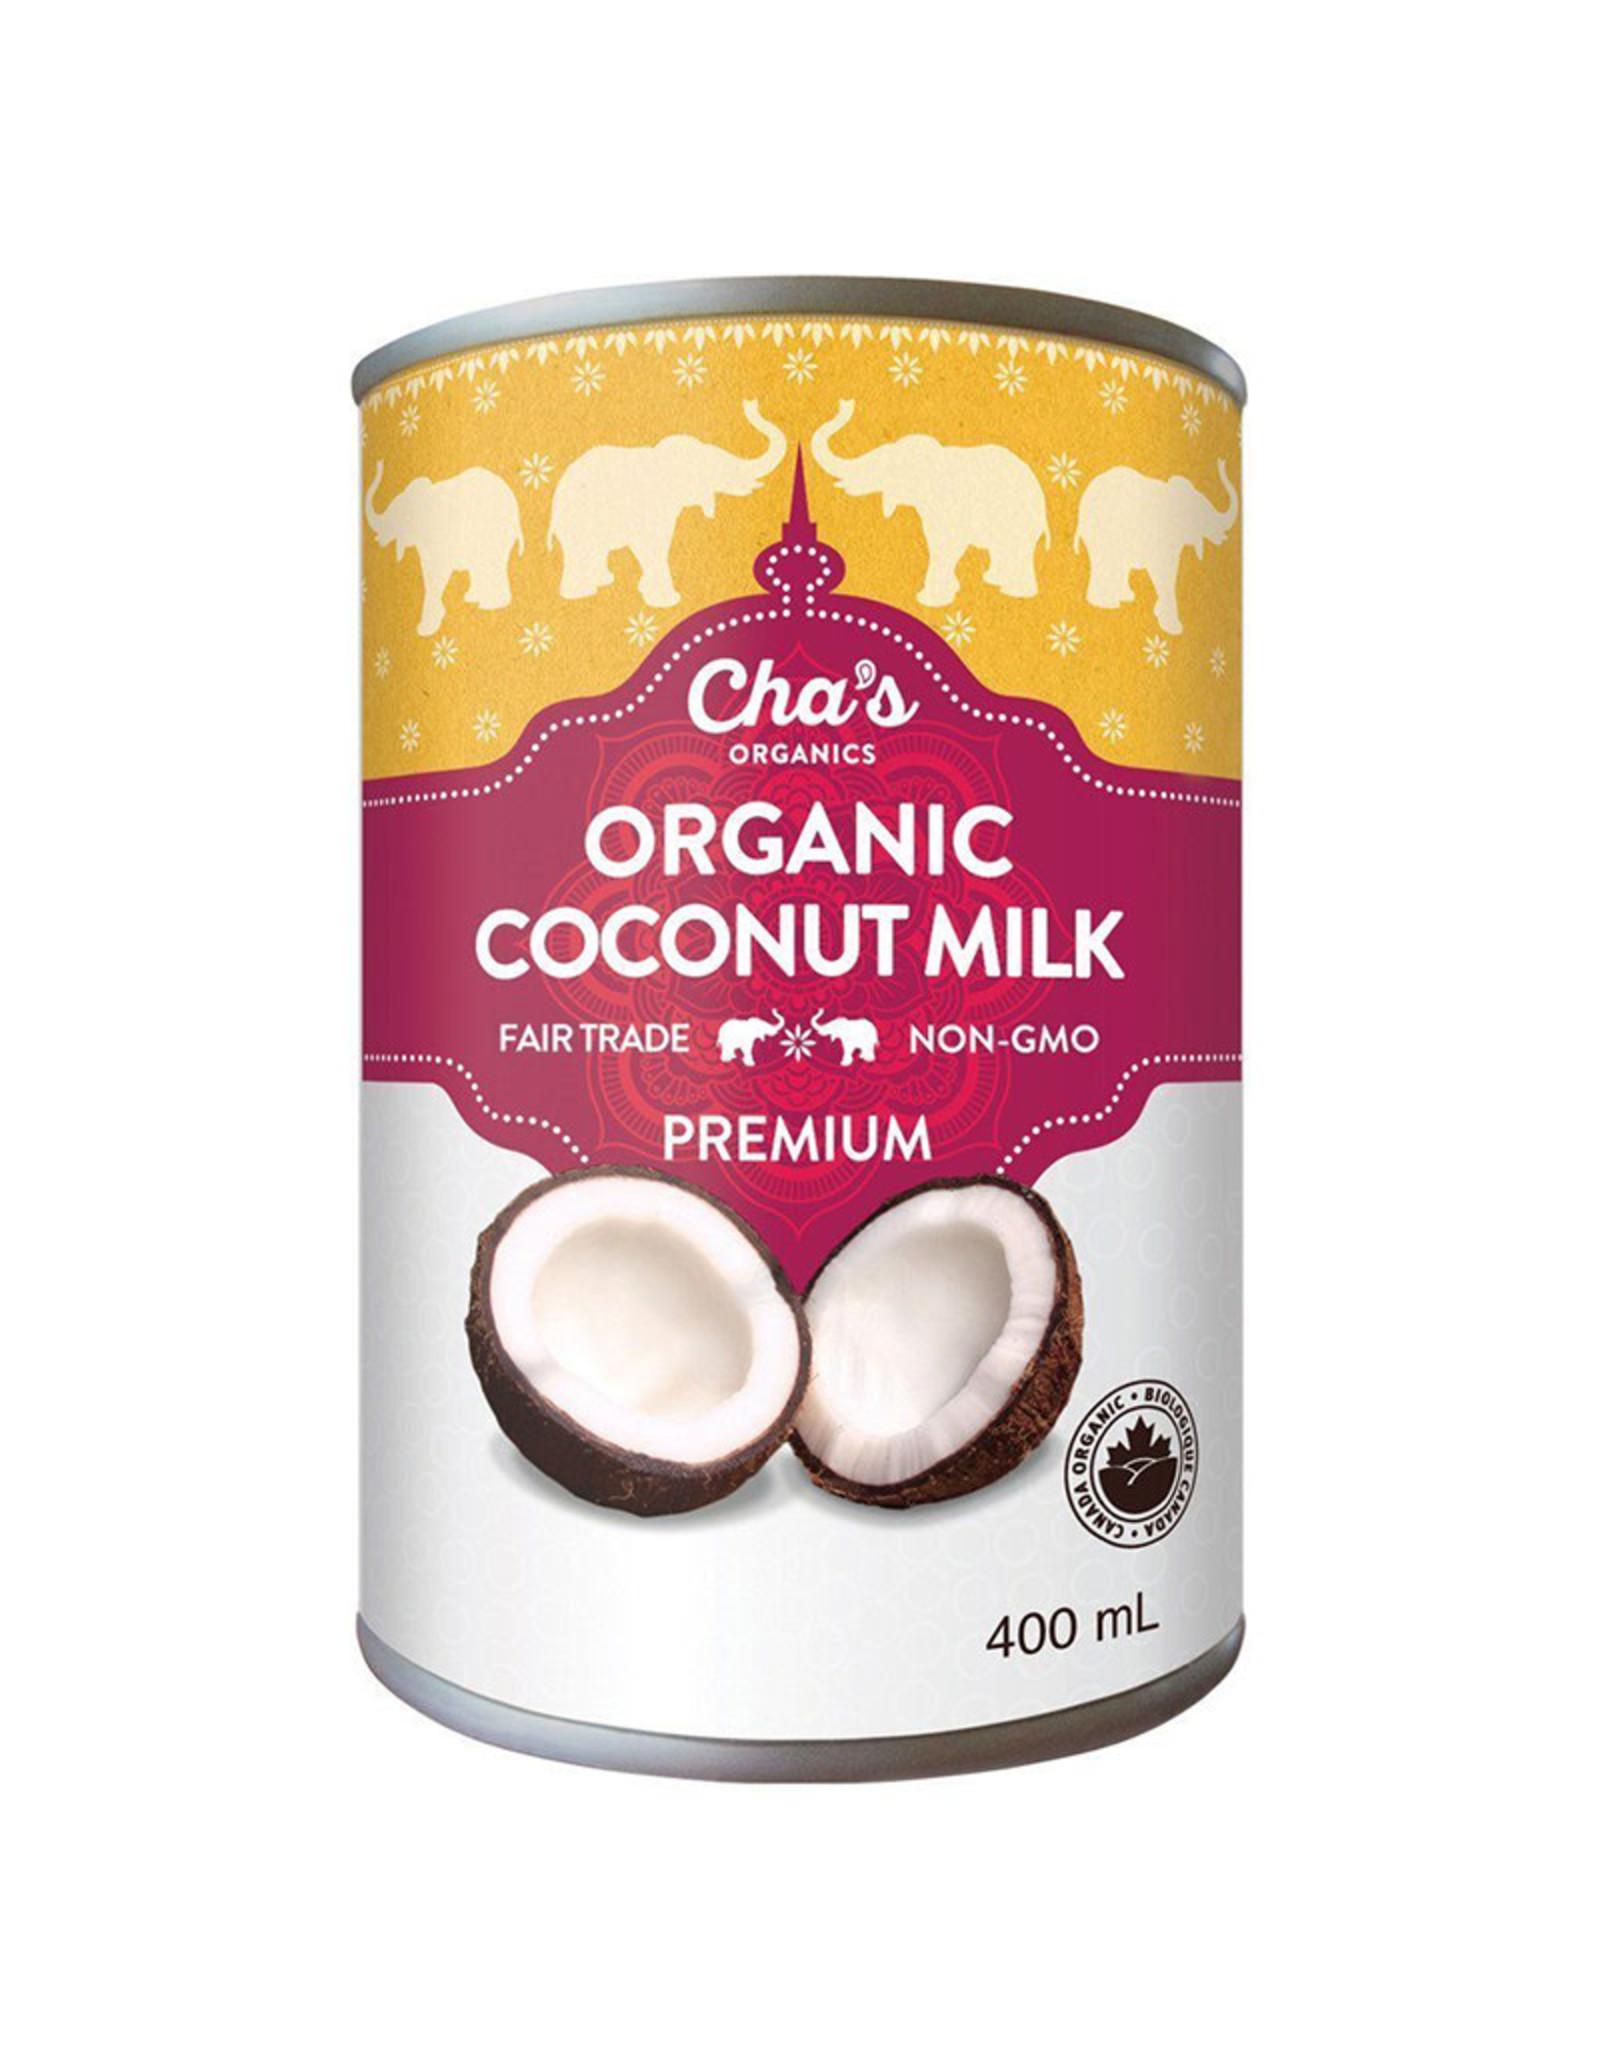 Chas Organics Chas Organics - Coconut Milk, Premium (400ml)